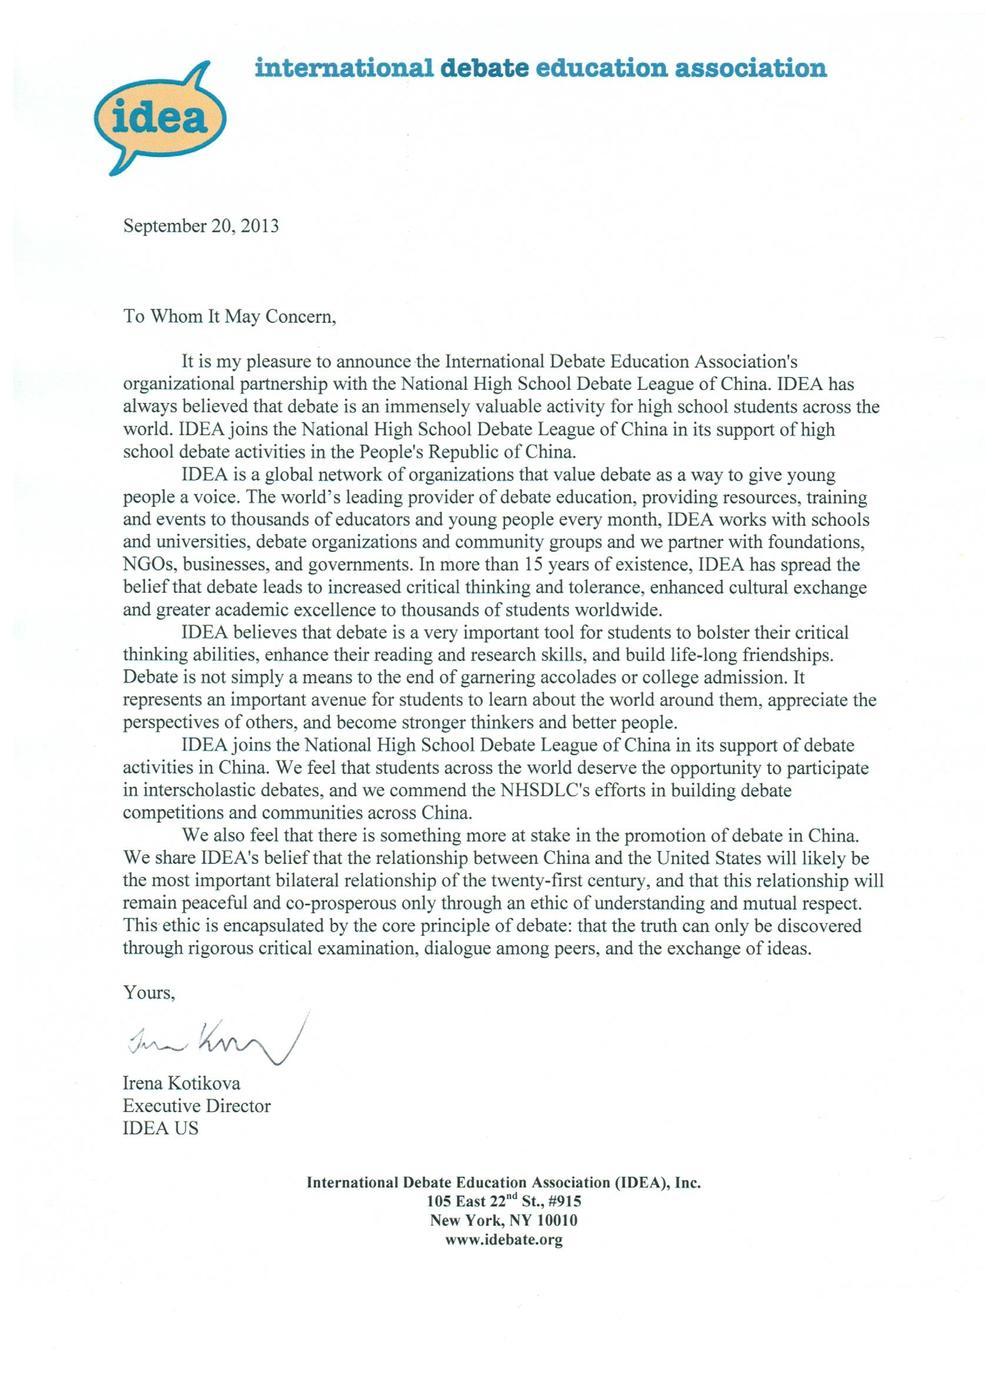 IDEA Letter.jpeg